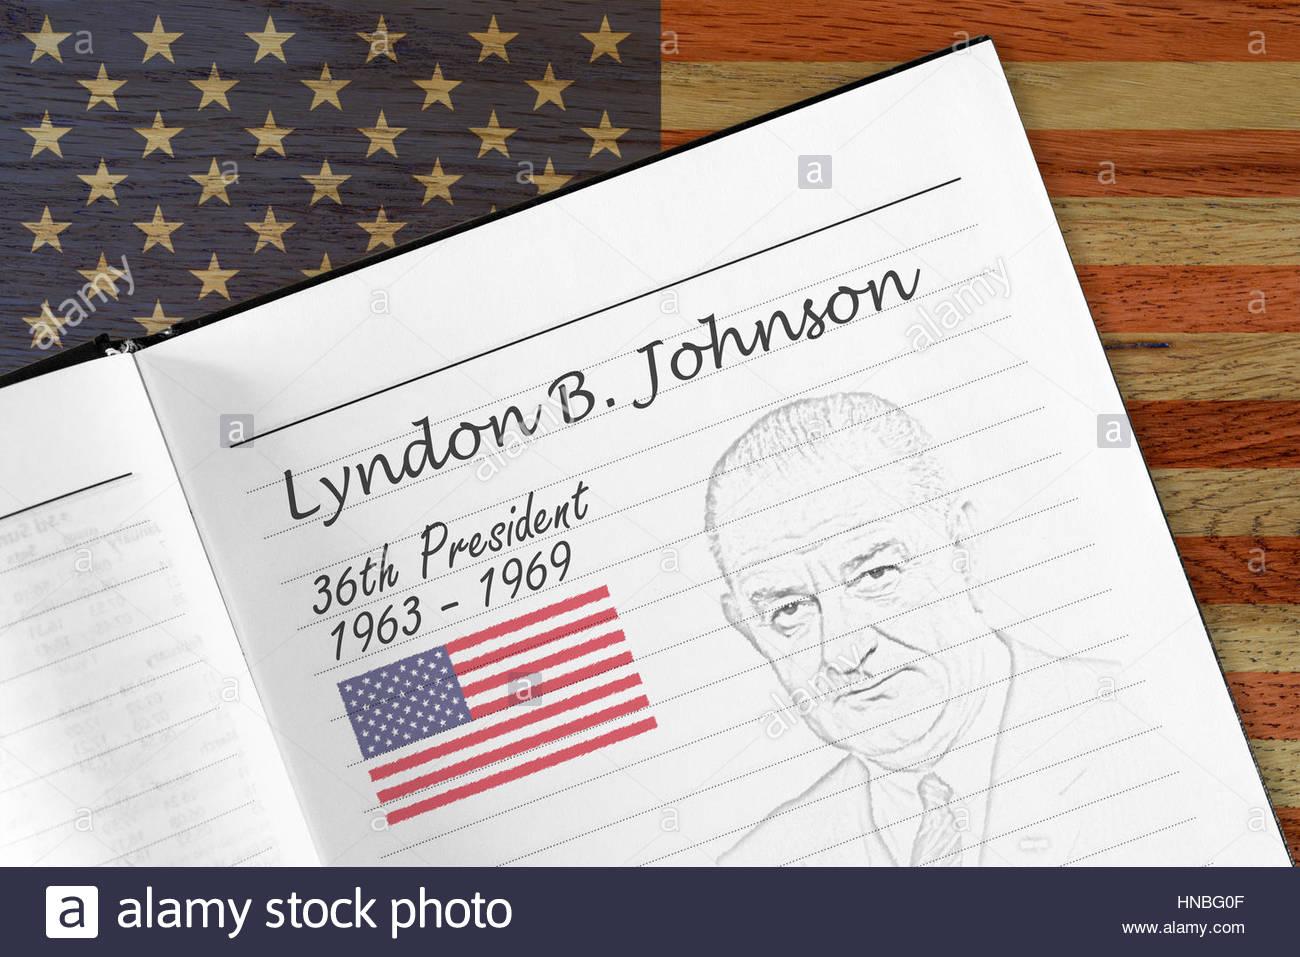 Lyndon B. Johnson, presidency sketch Stock Photo